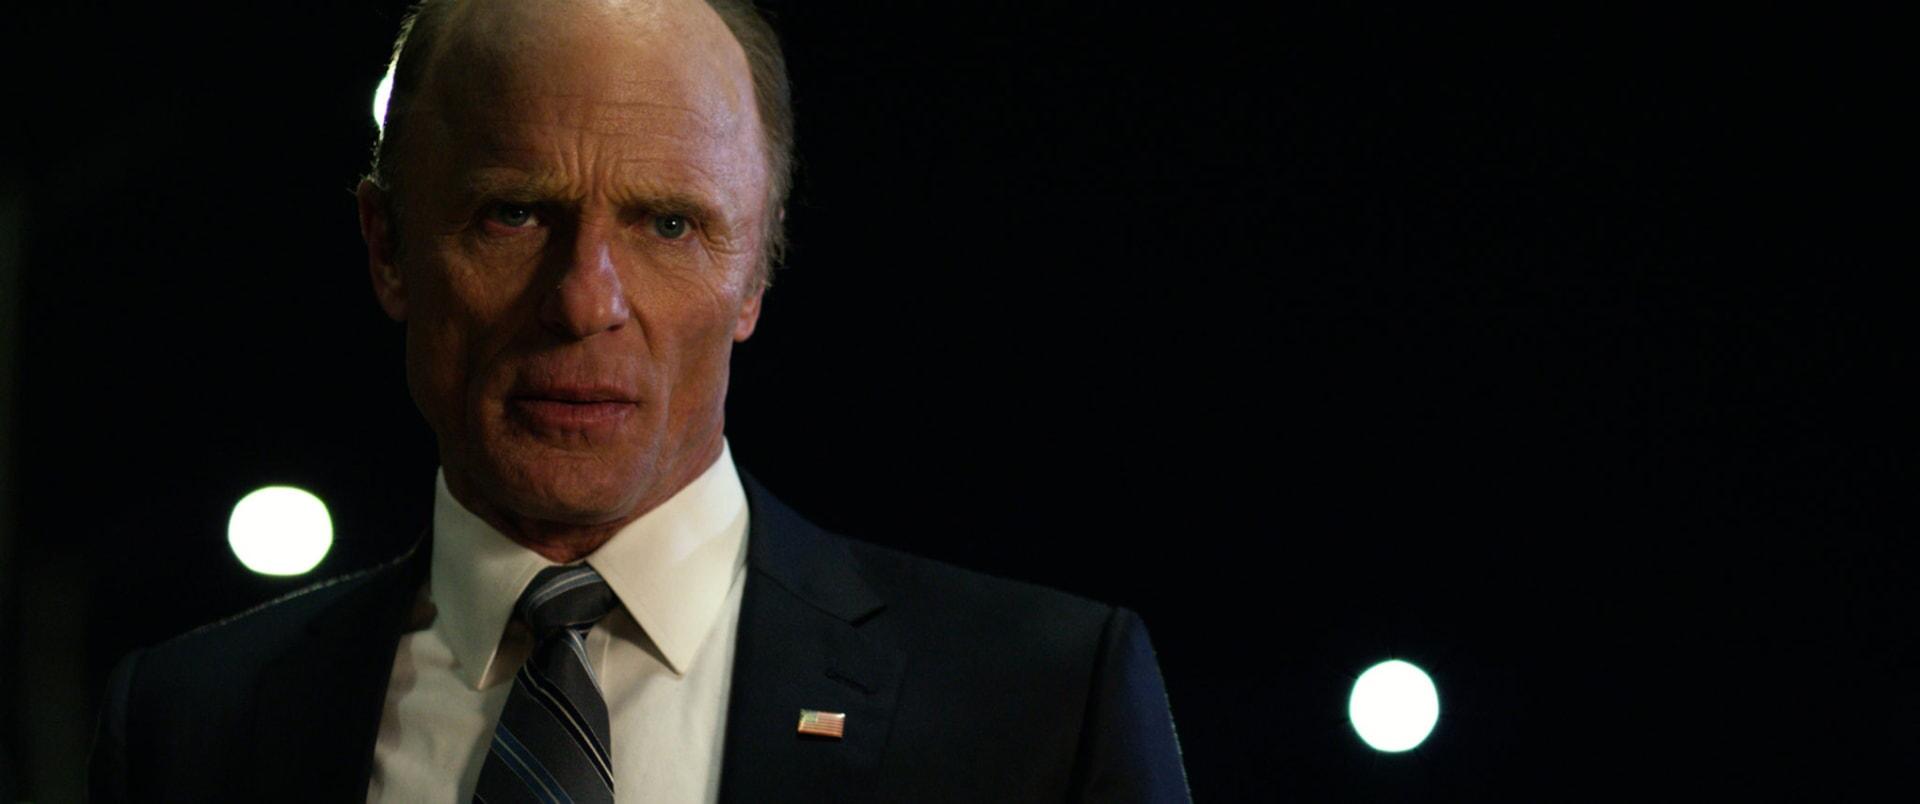 "ED HARRIS as Secretary of State Leonard Dekkom in Warner Bros. Pictures' and Skydance's suspense thriller ""GEOSTORM,"" a Warner Bros. Pictures release."